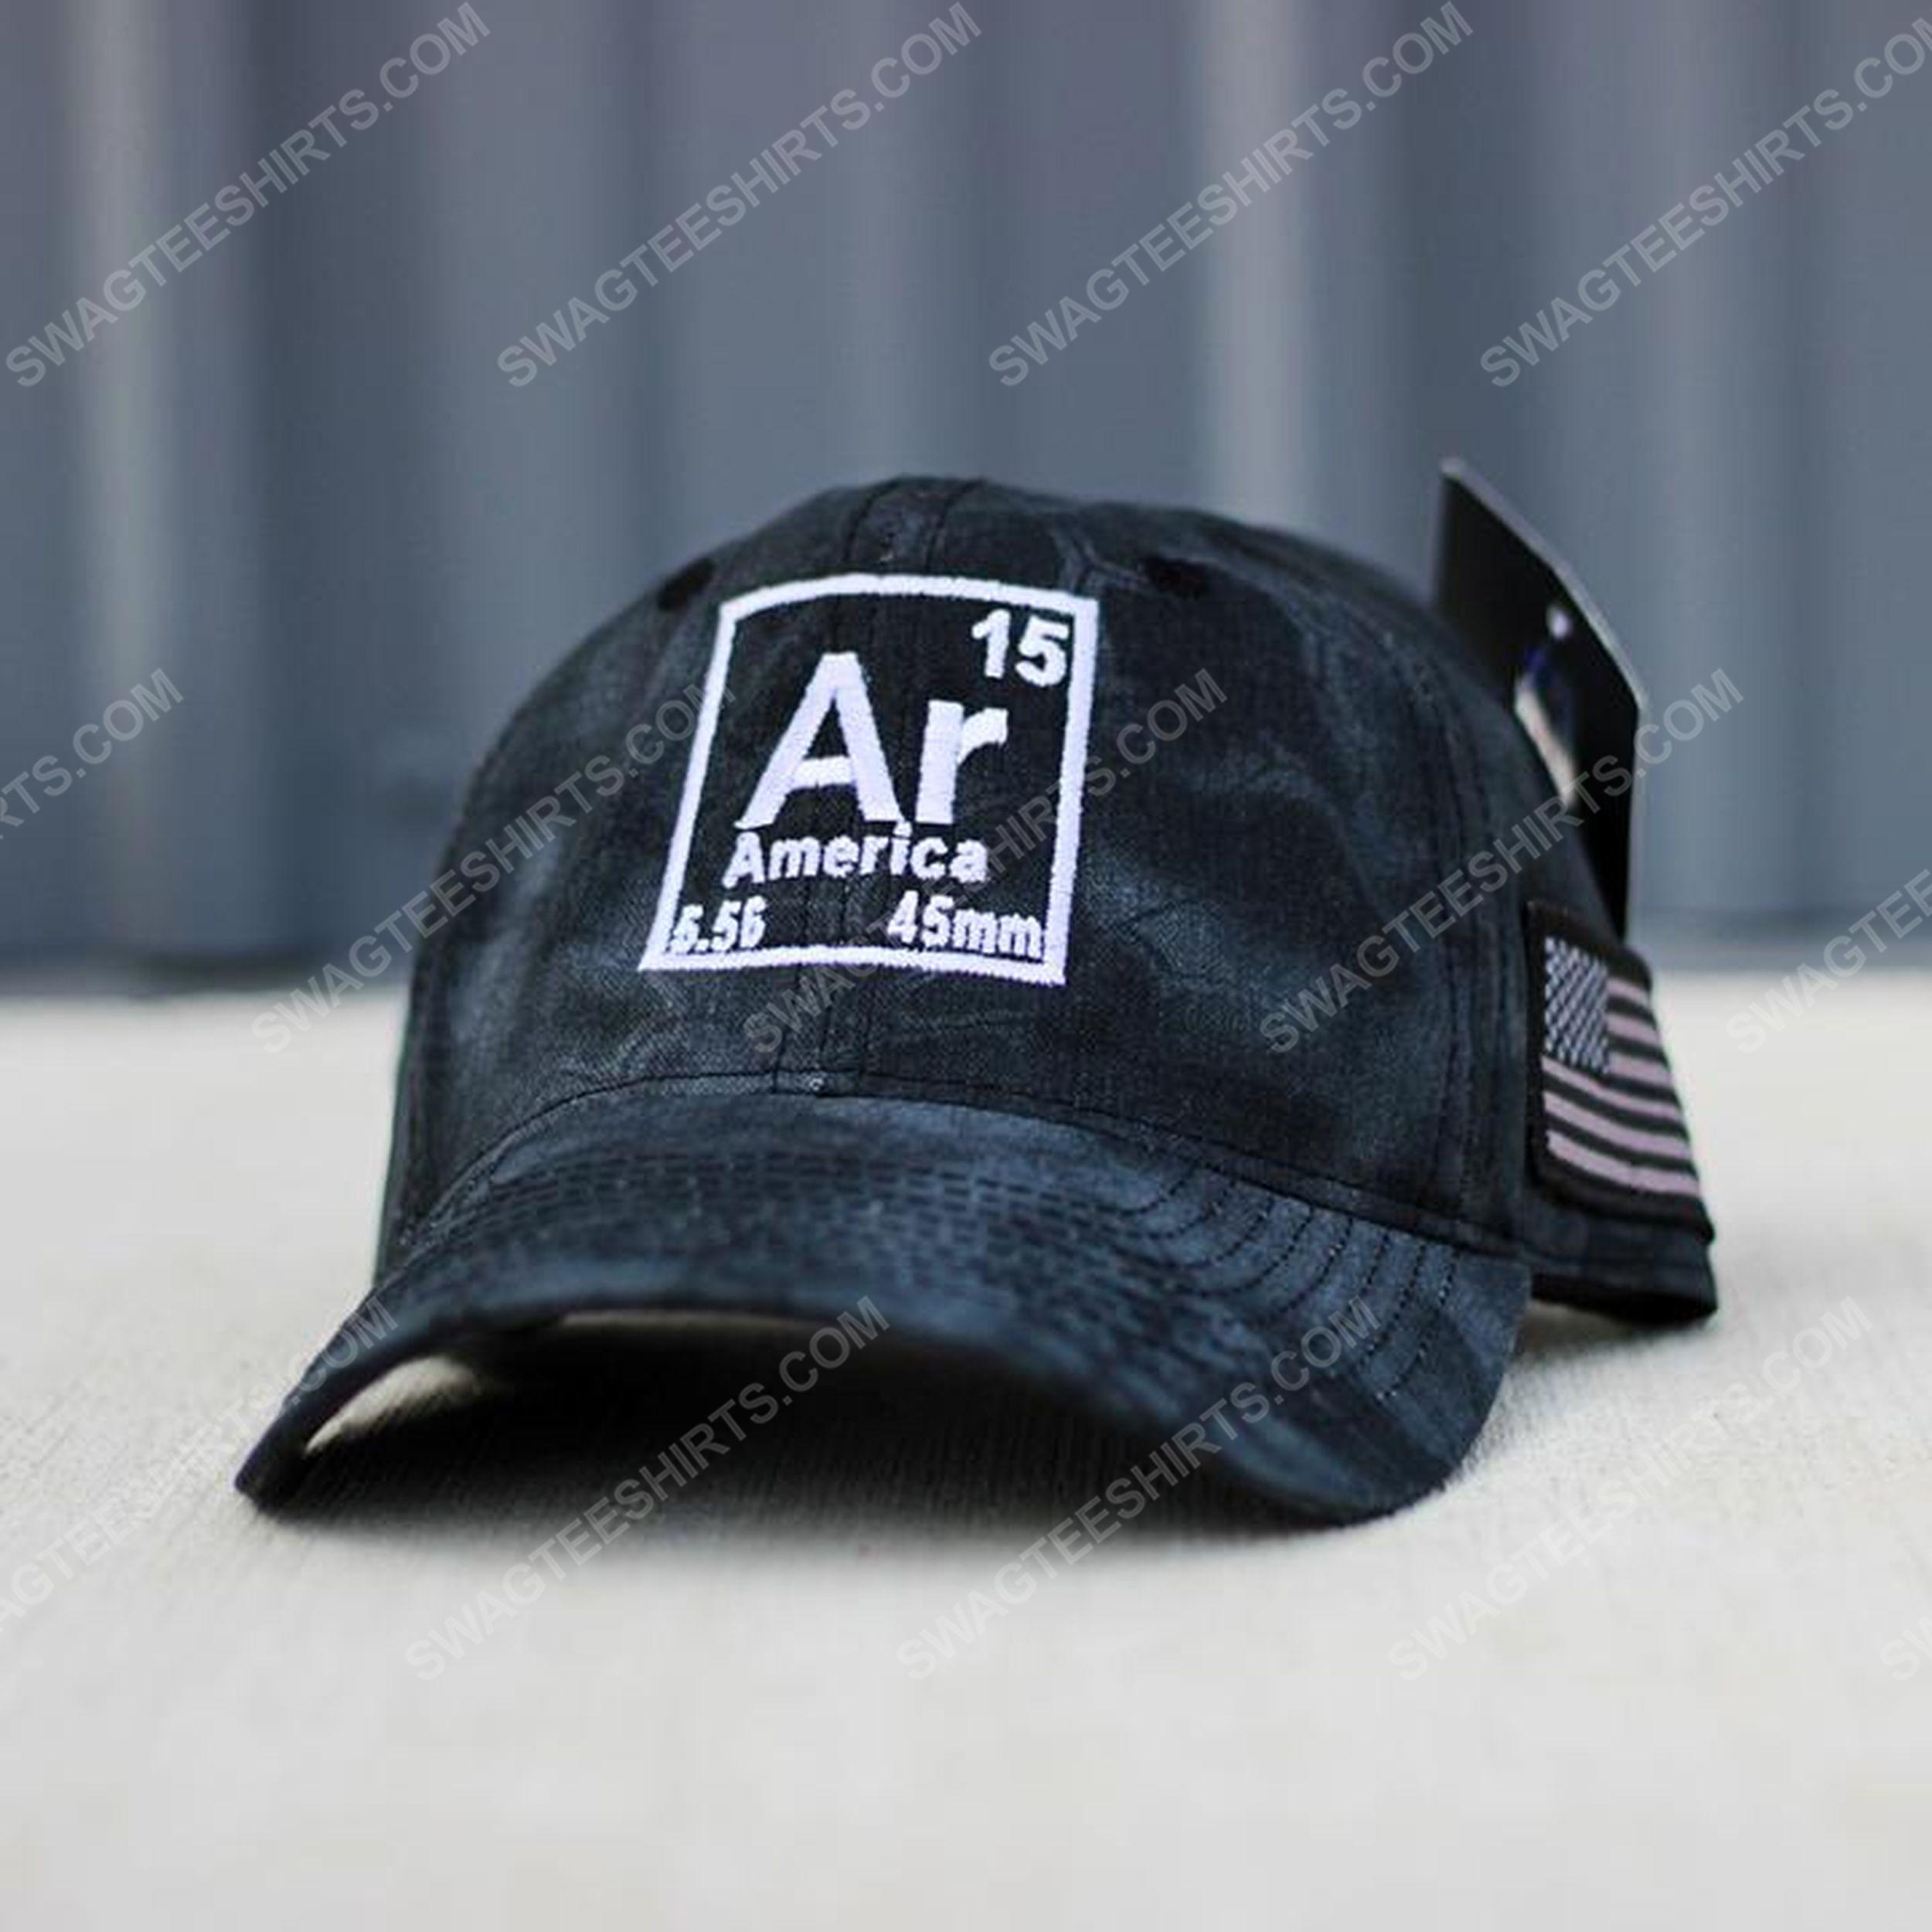 Ar 15 american full print classic hat 1 - Copy (2)